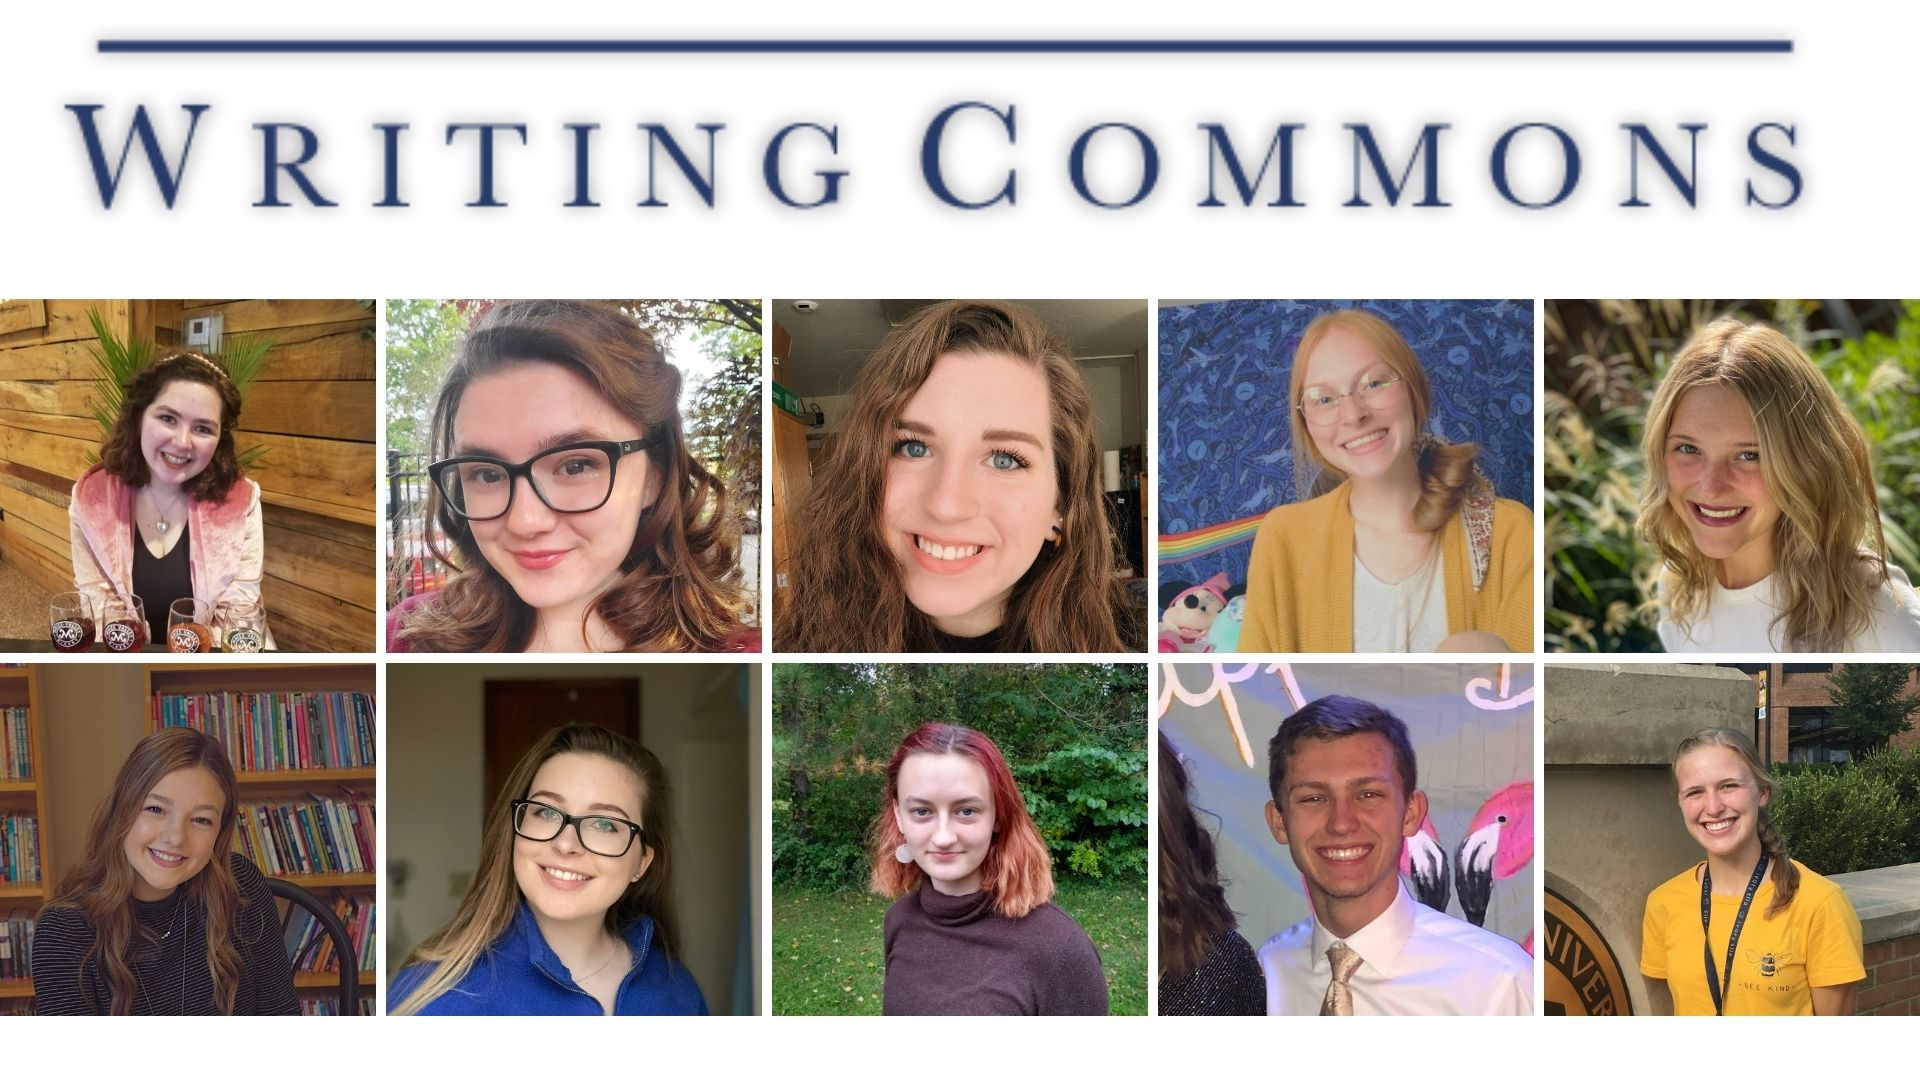 Writing Commons Staff